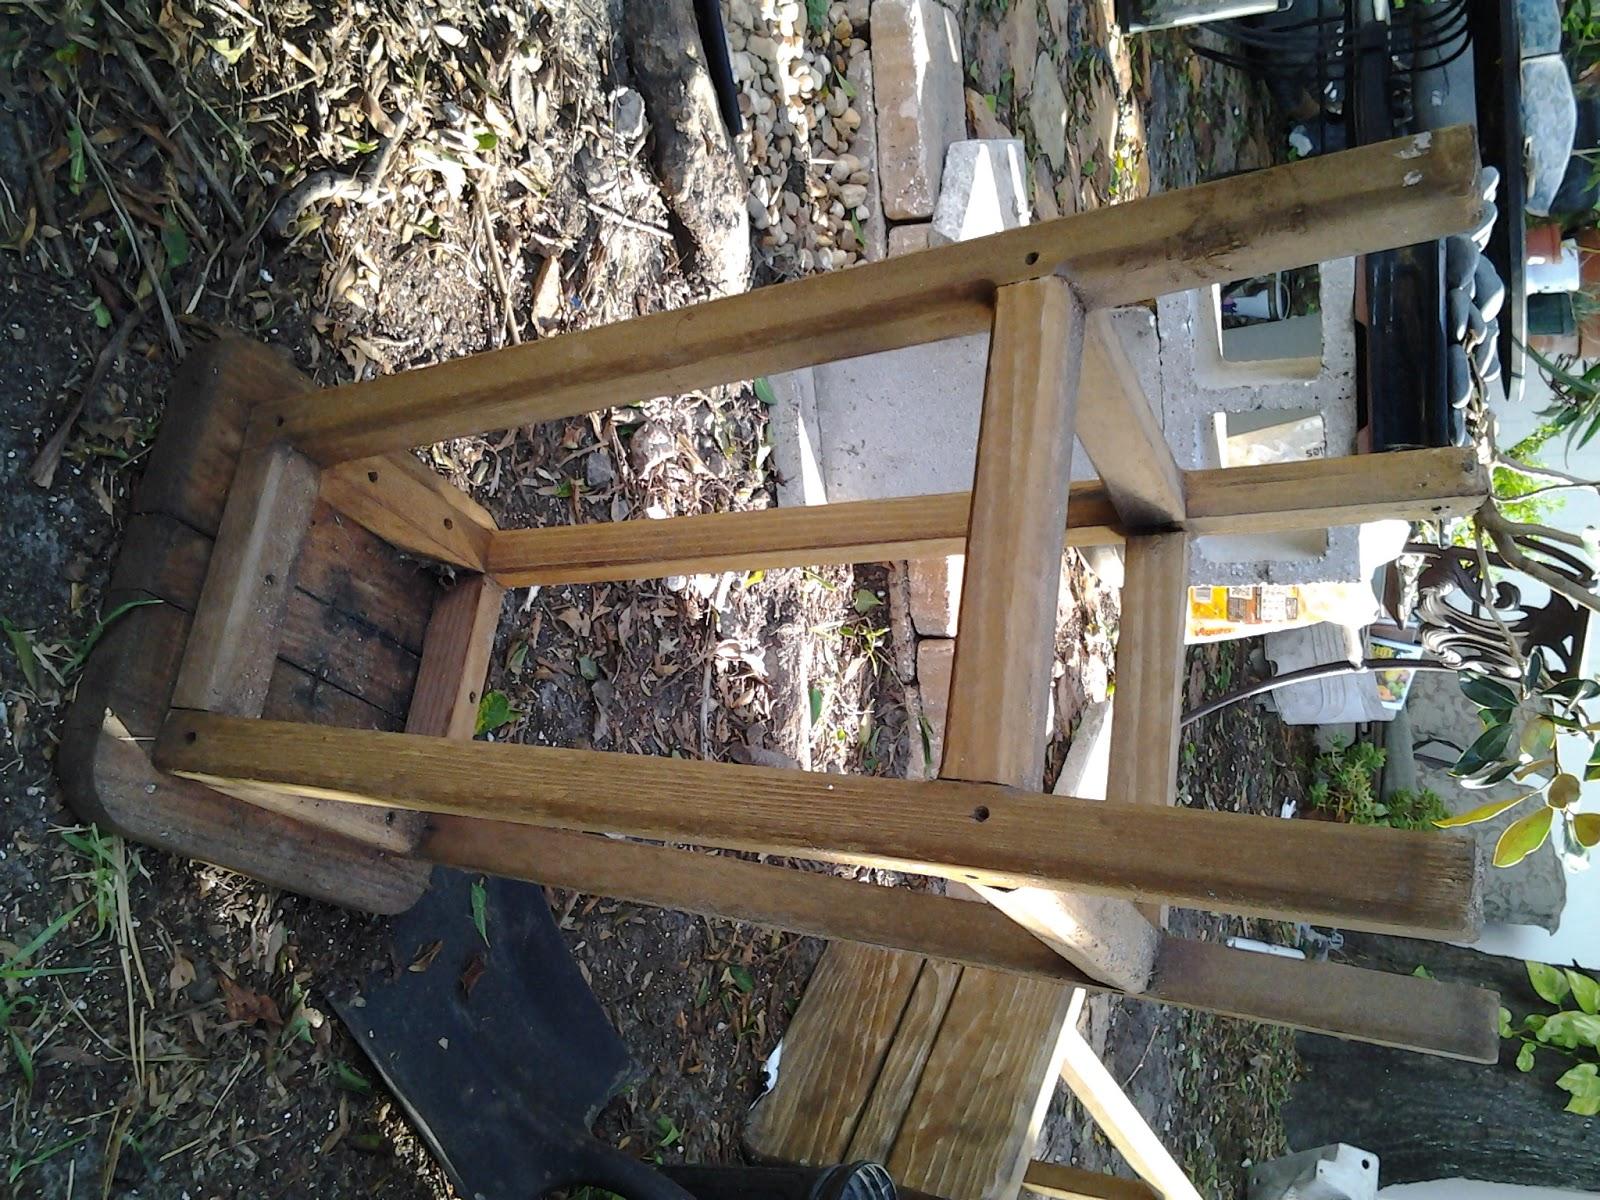 Mattyboo S Mind Diy Garden Project An Old Wooden Stool